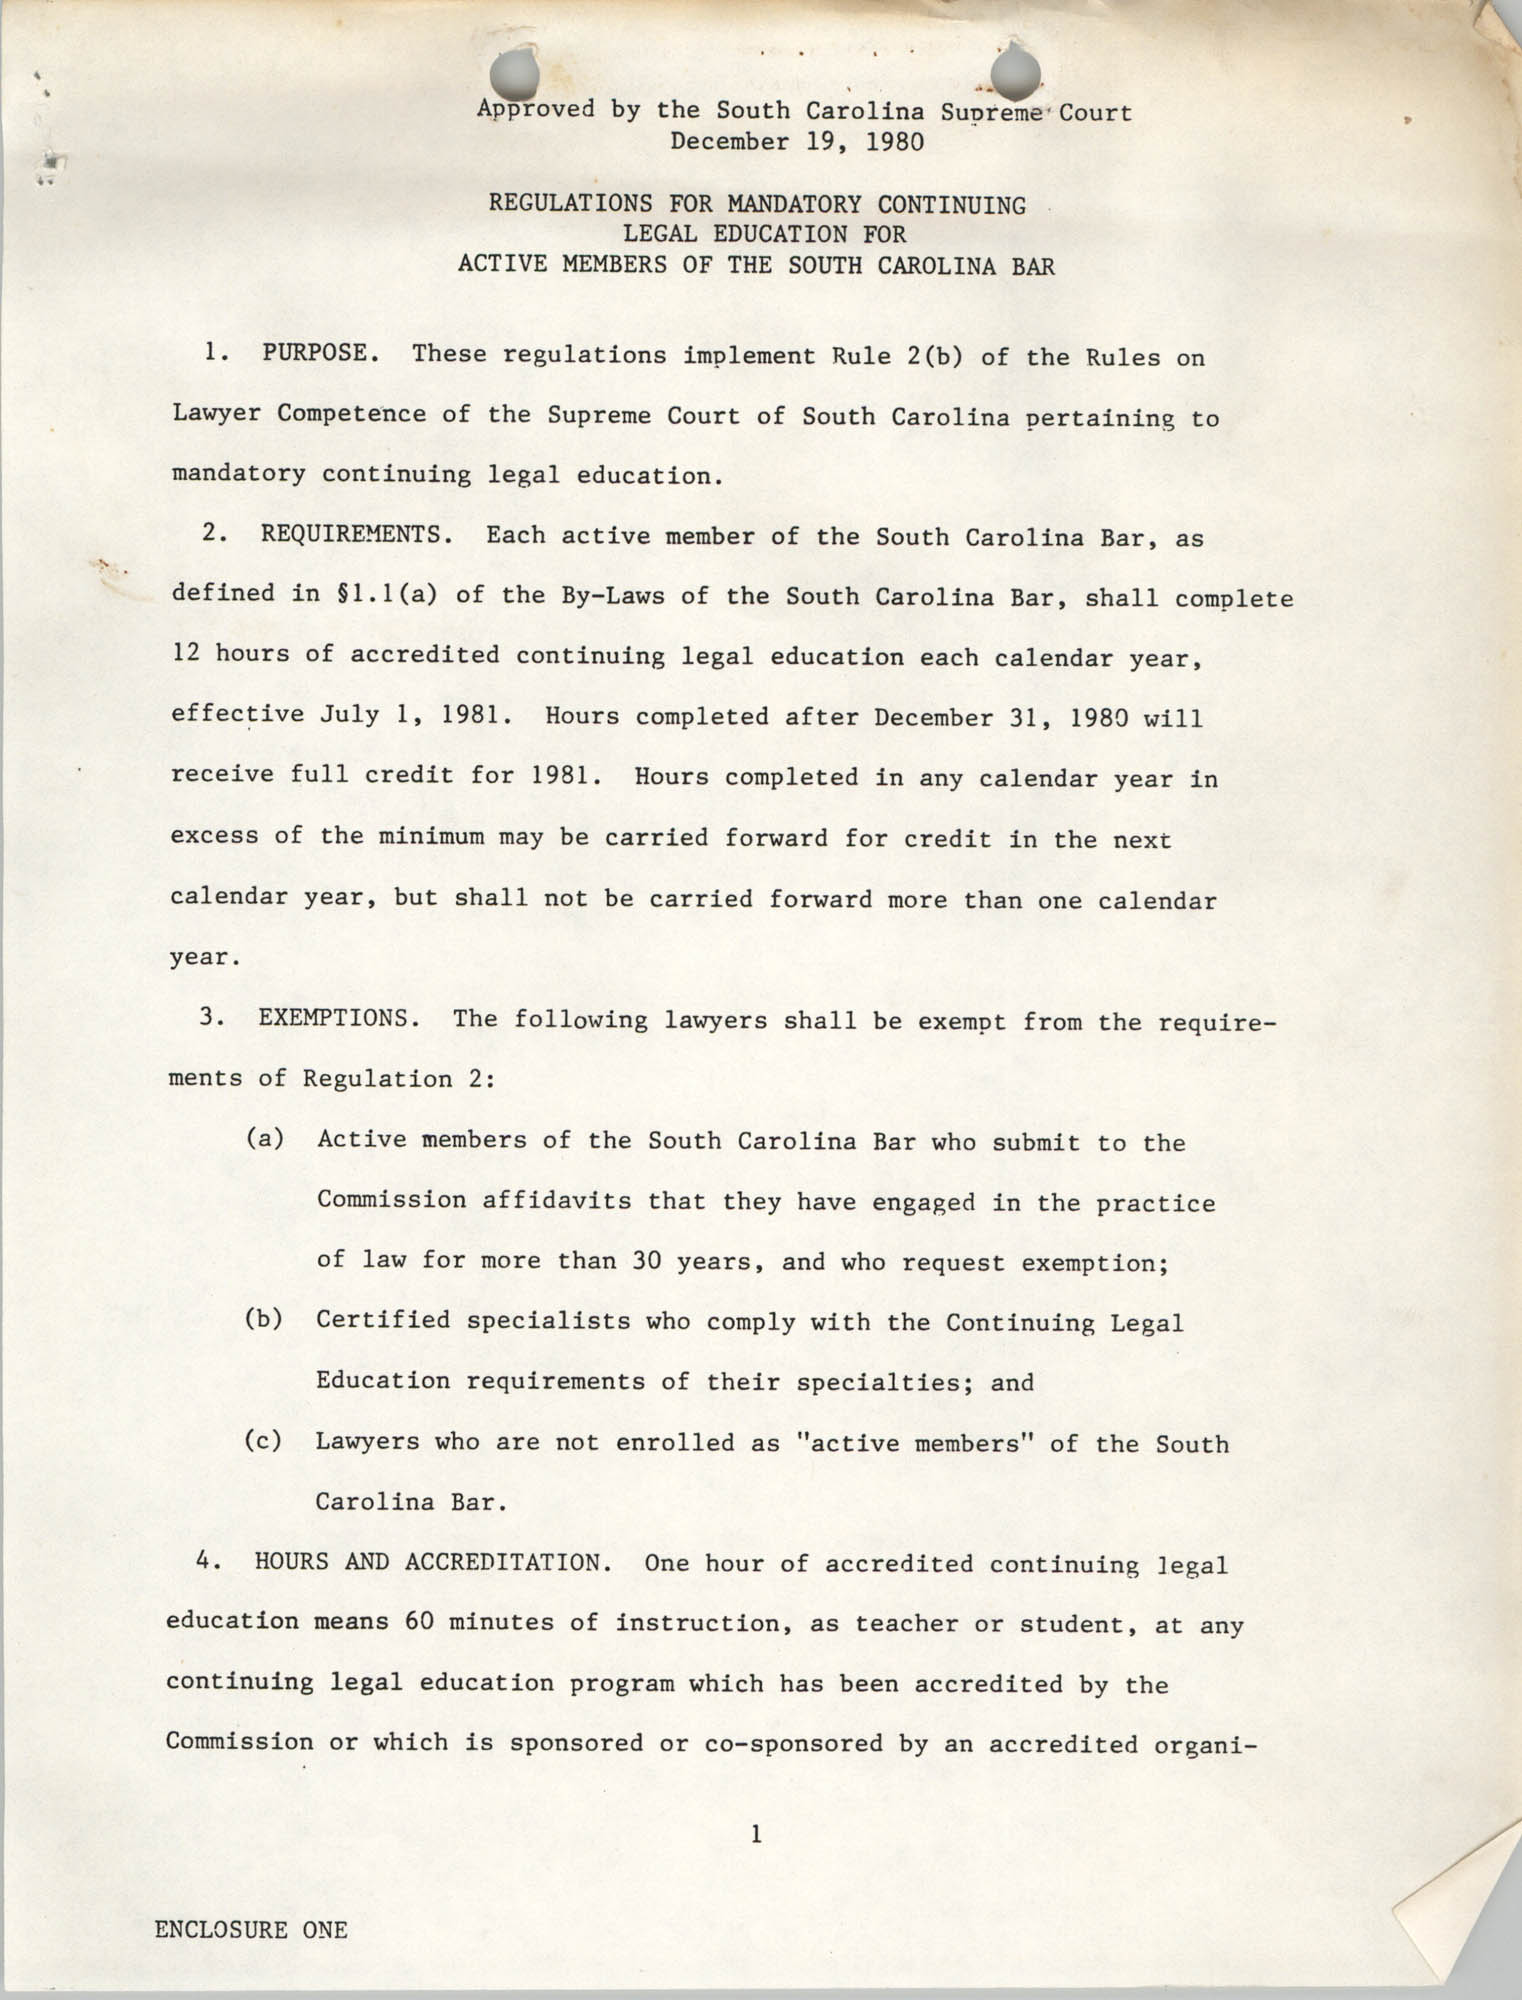 Regulations for Mandatory Continuing  Legal Education for Active Members of the South Carolina Bar, South Carolina Supreme Court, December 19, 1980